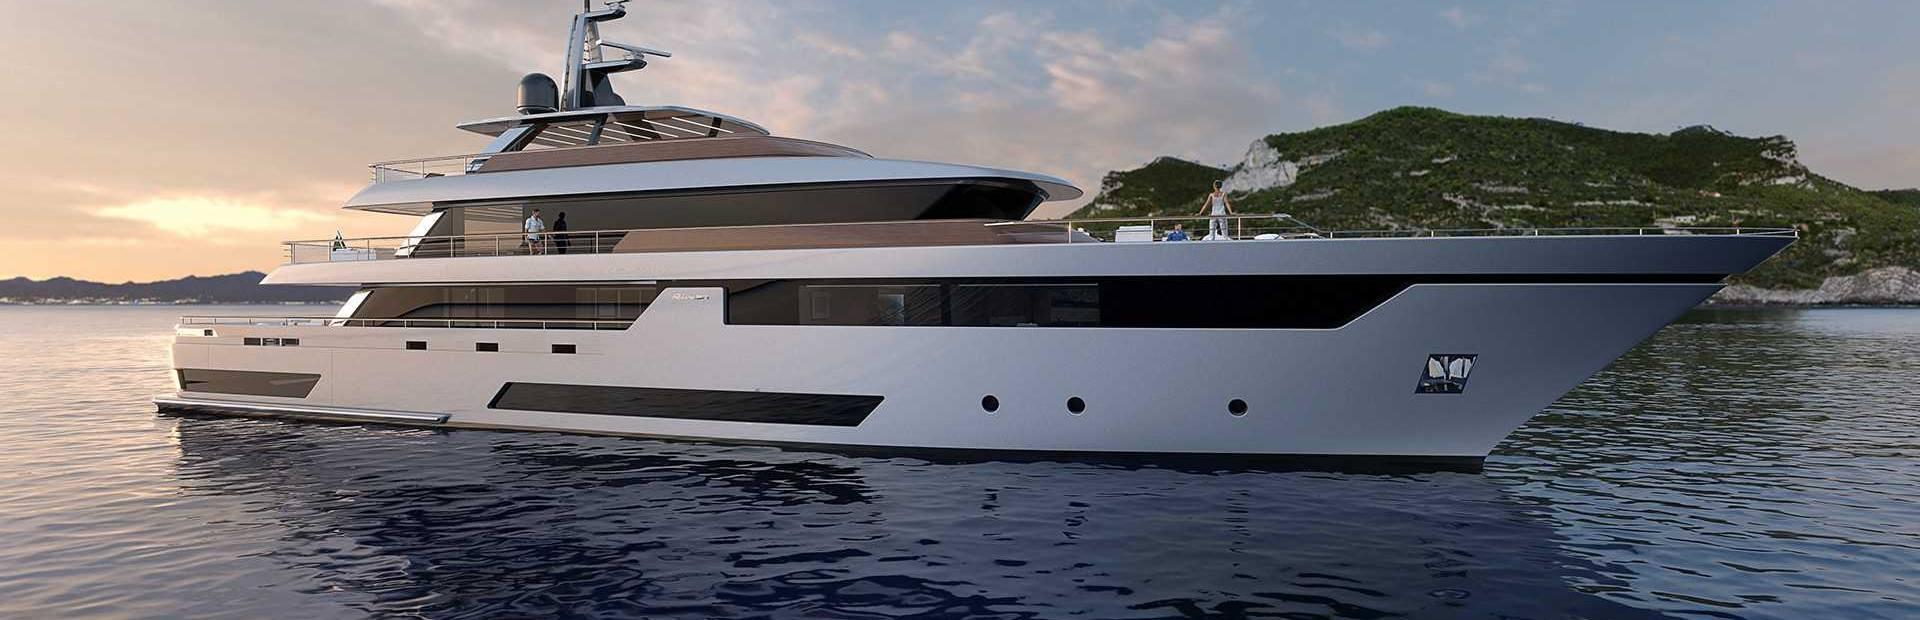 50Metri Yacht Charter